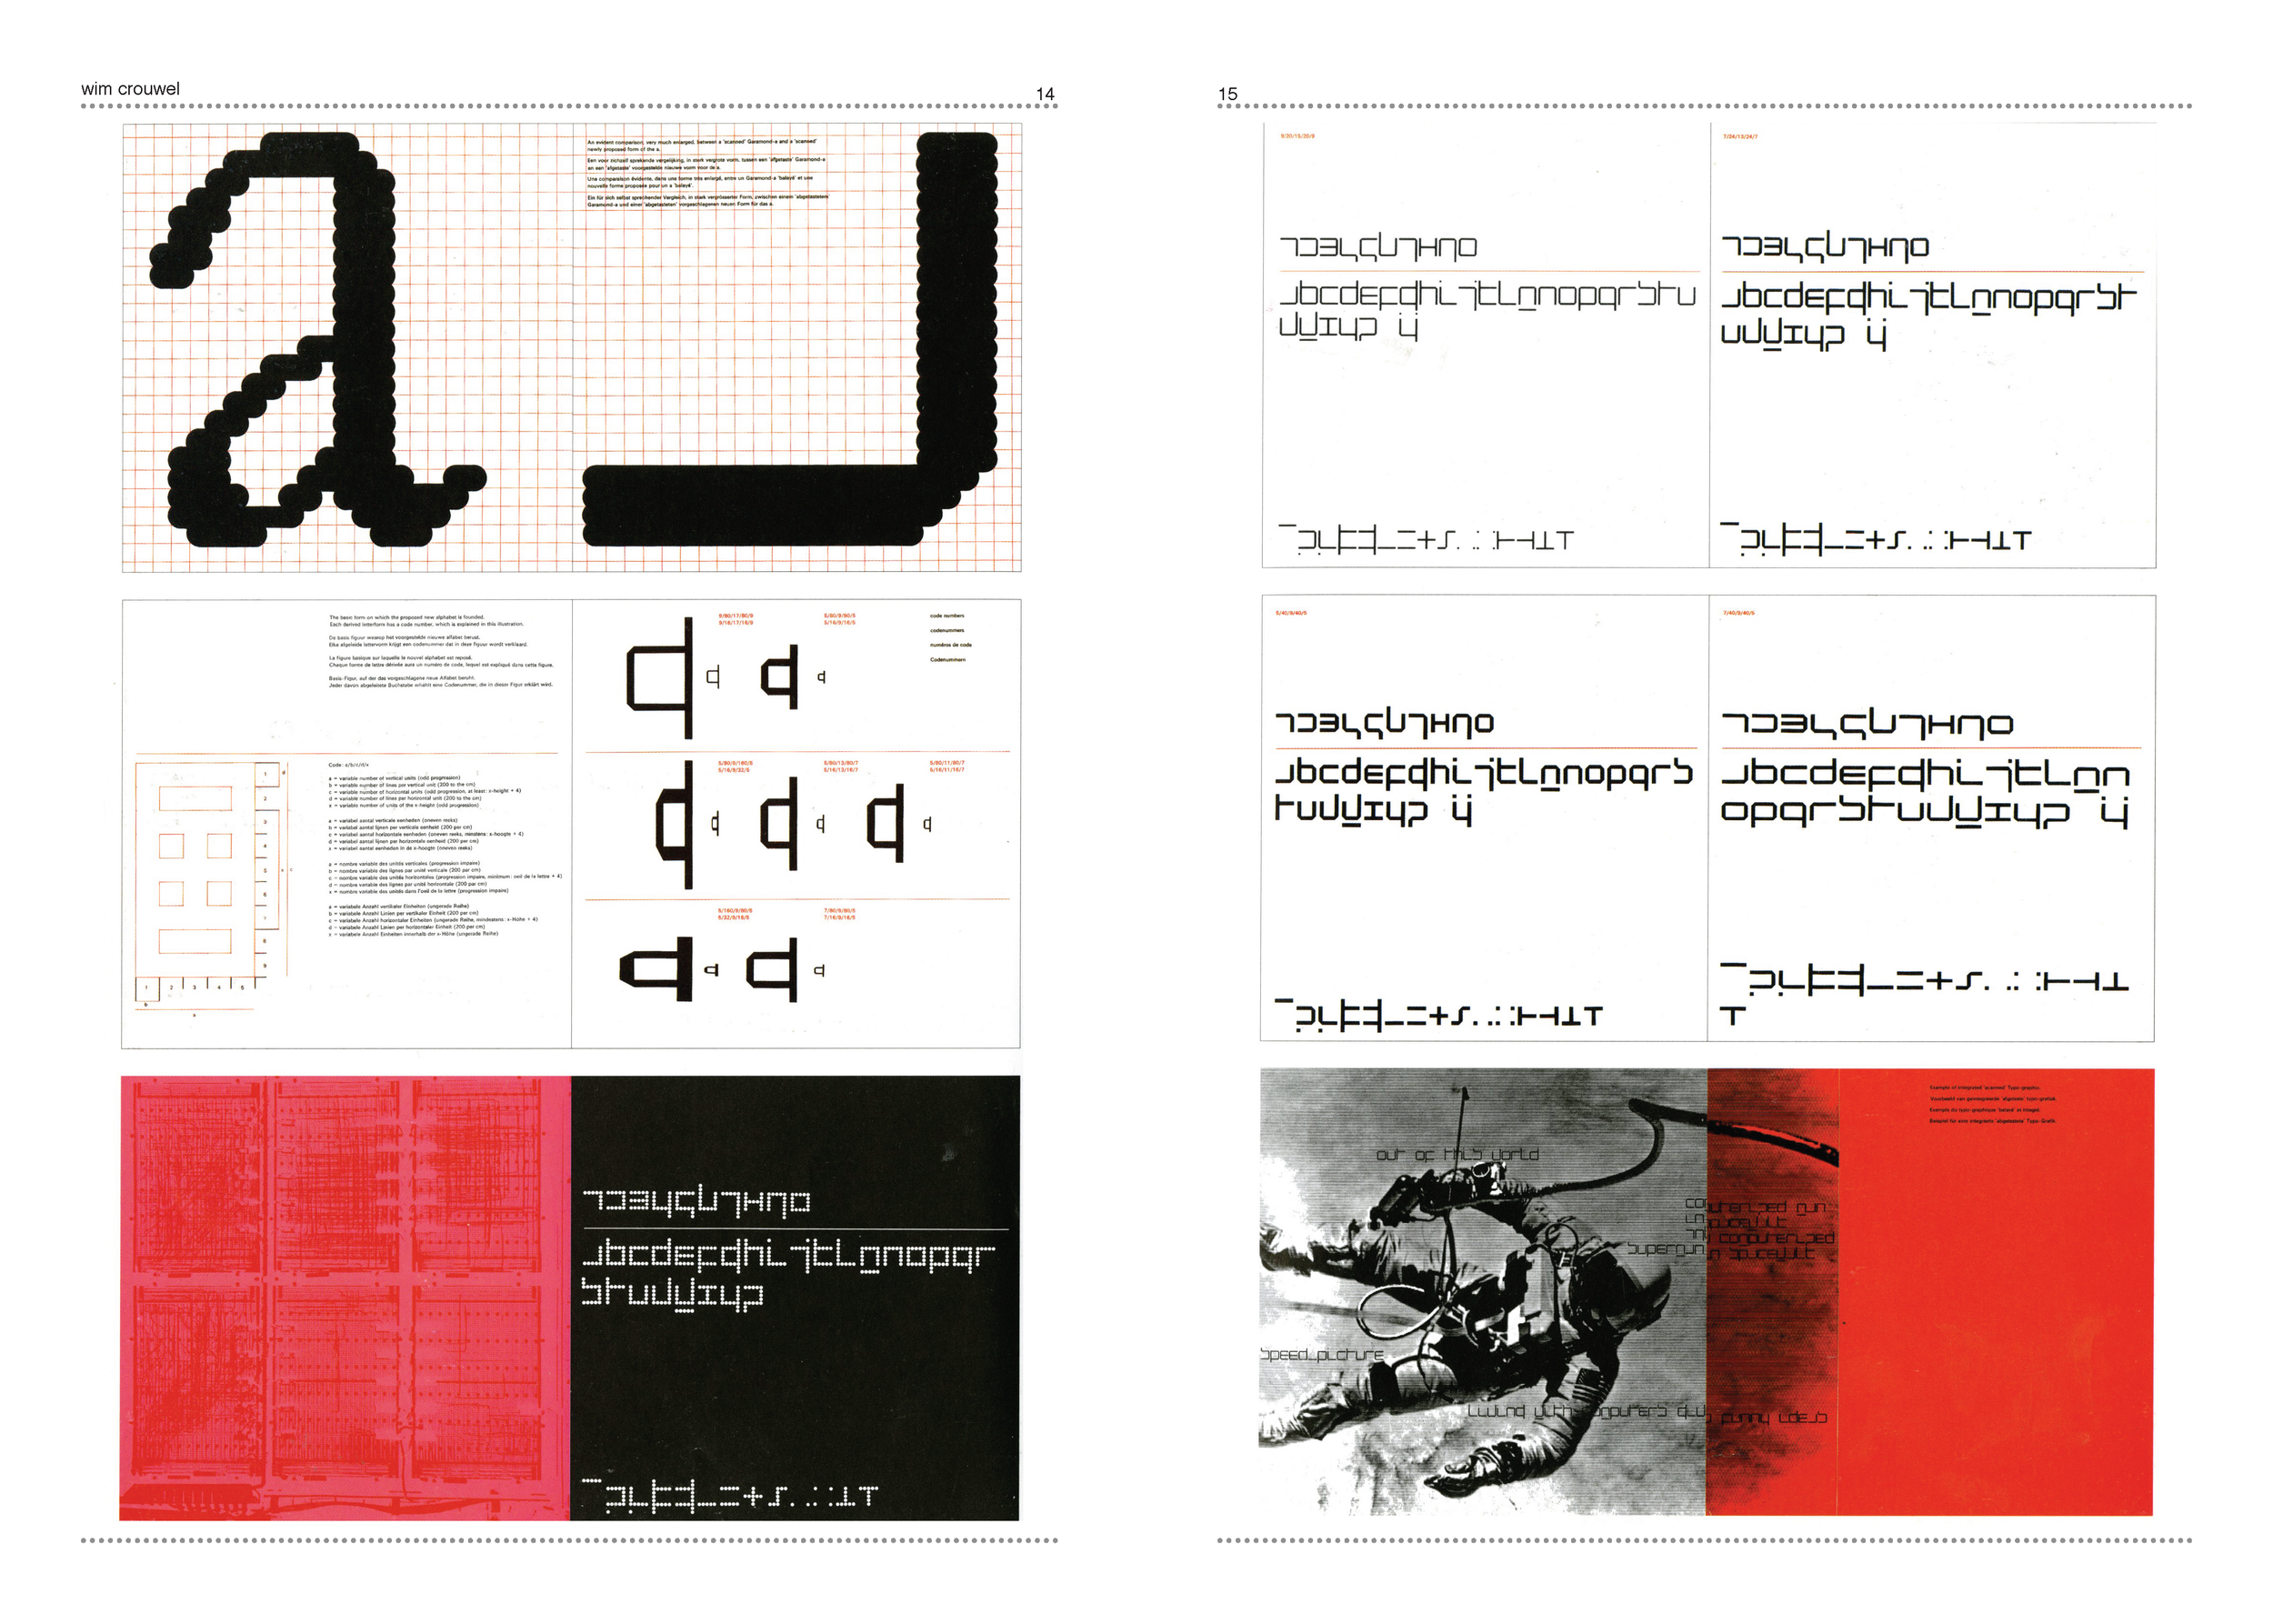 wim_crouwel_booklet copy_Page_08.png